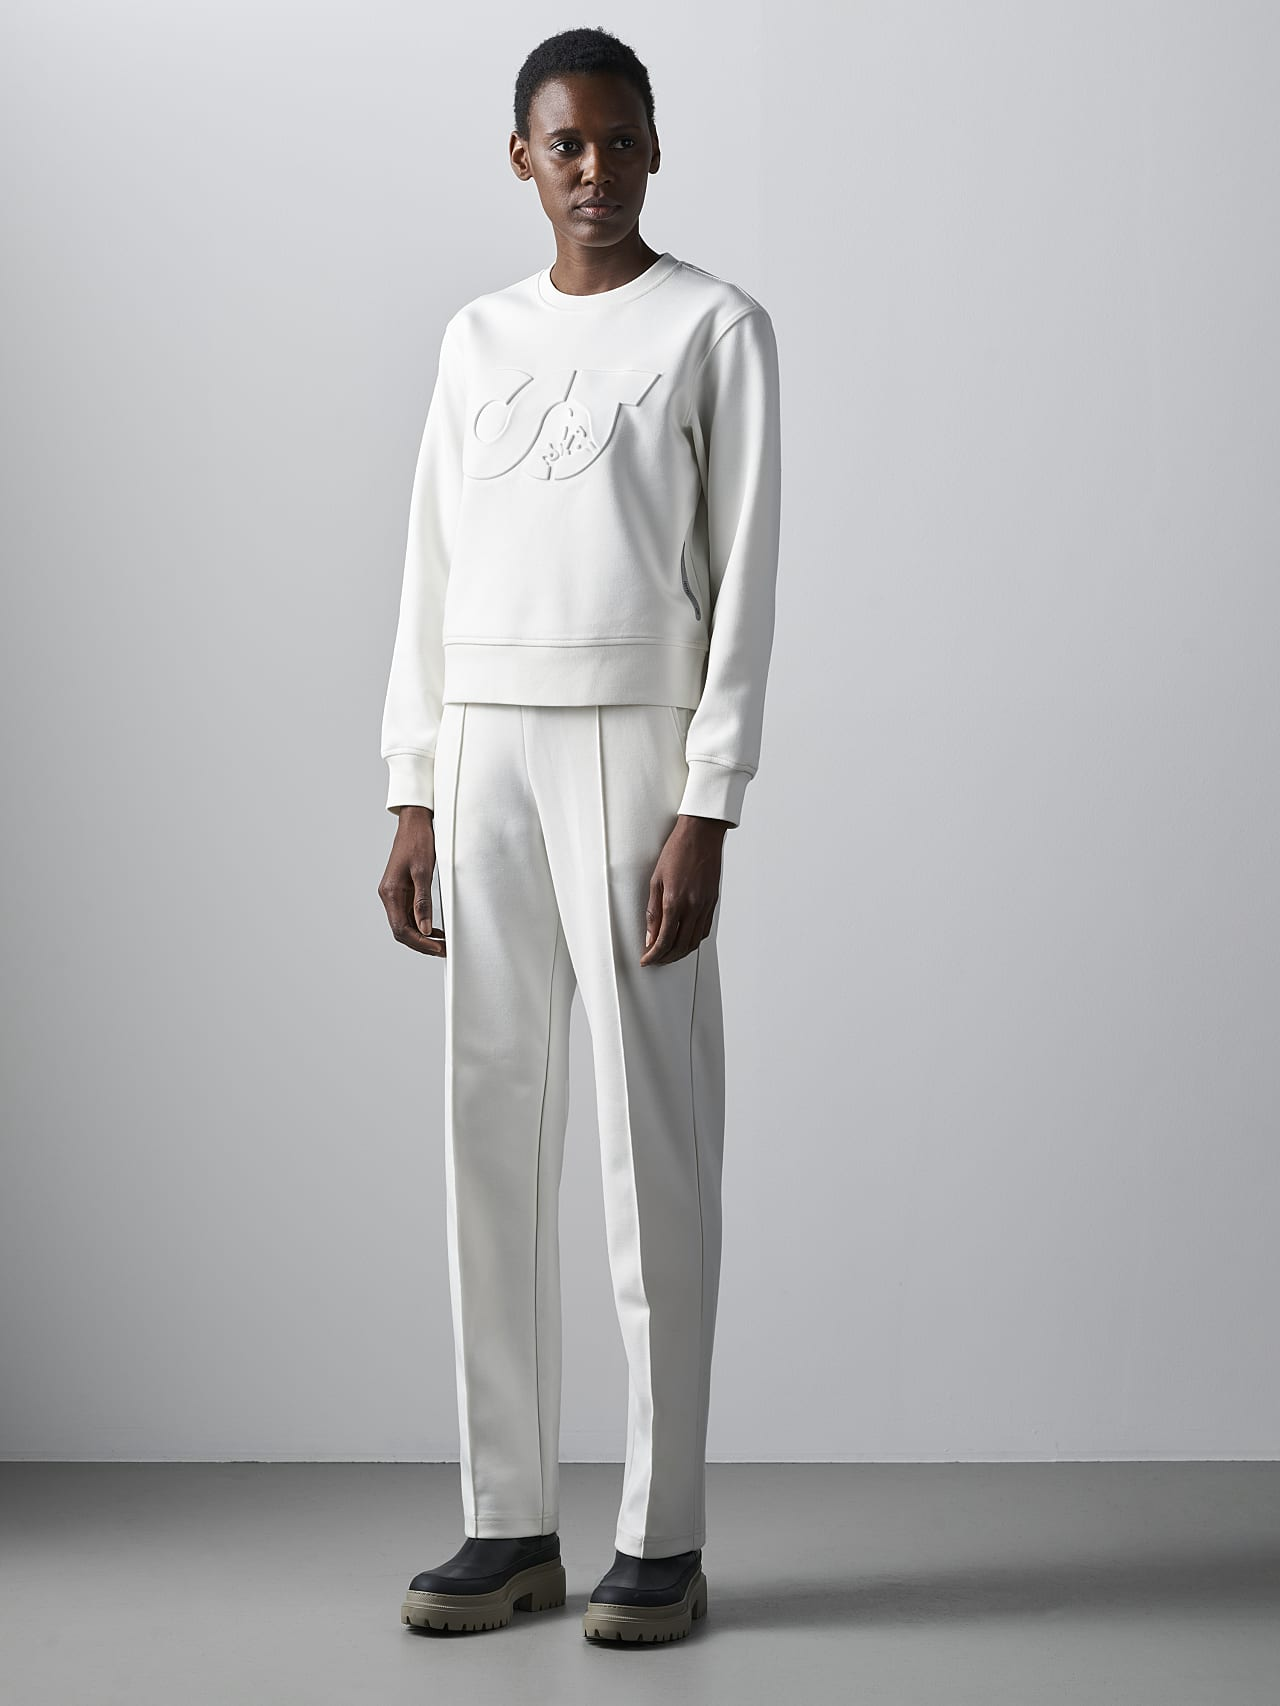 SHINT V1.Y5.02 Premium Logo Sweater offwhite Front Alpha Tauri